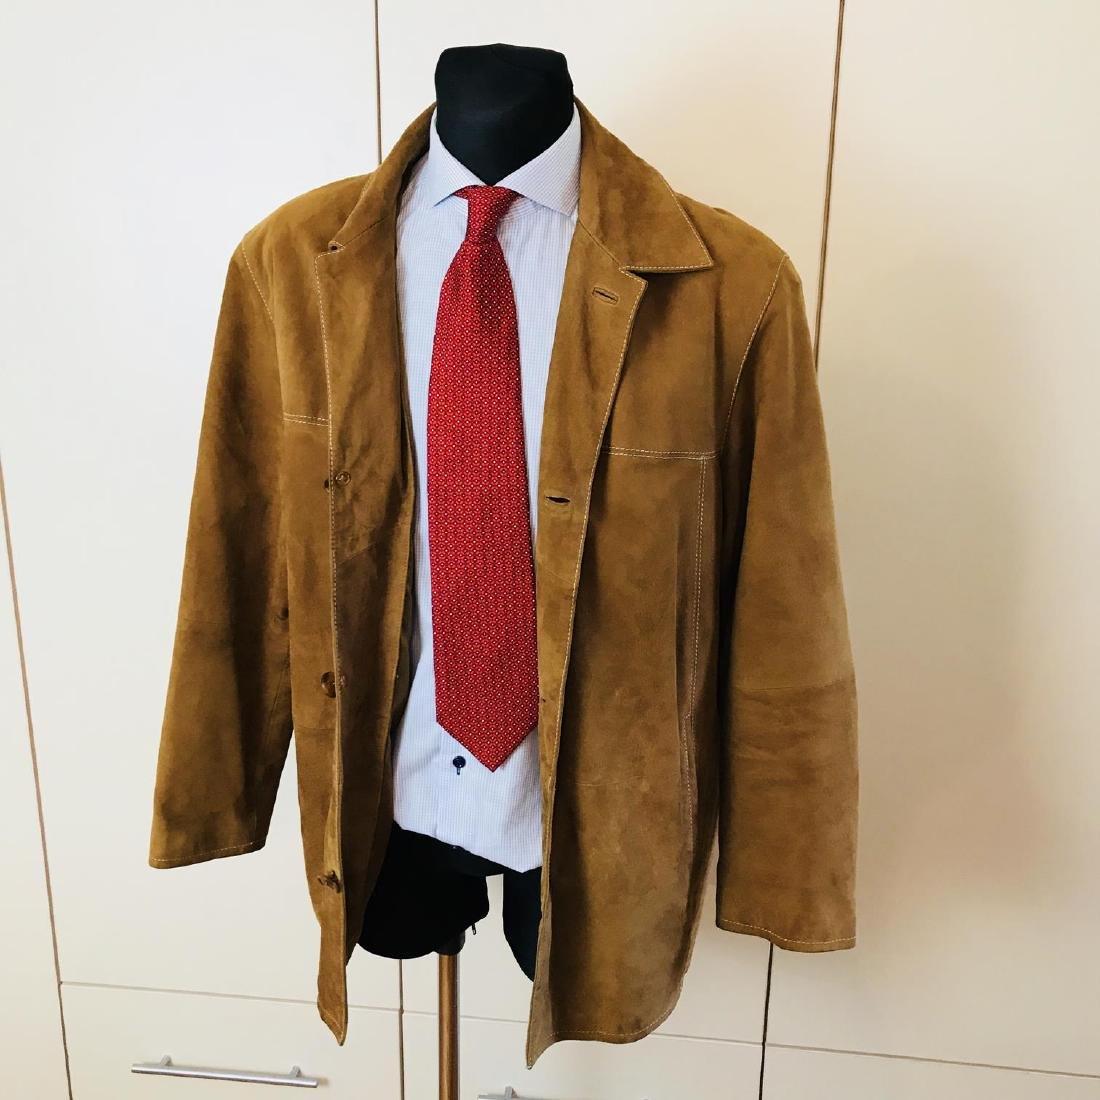 Vintage Men's Brown Suede Leather Jacket Coat Size 40 - 4